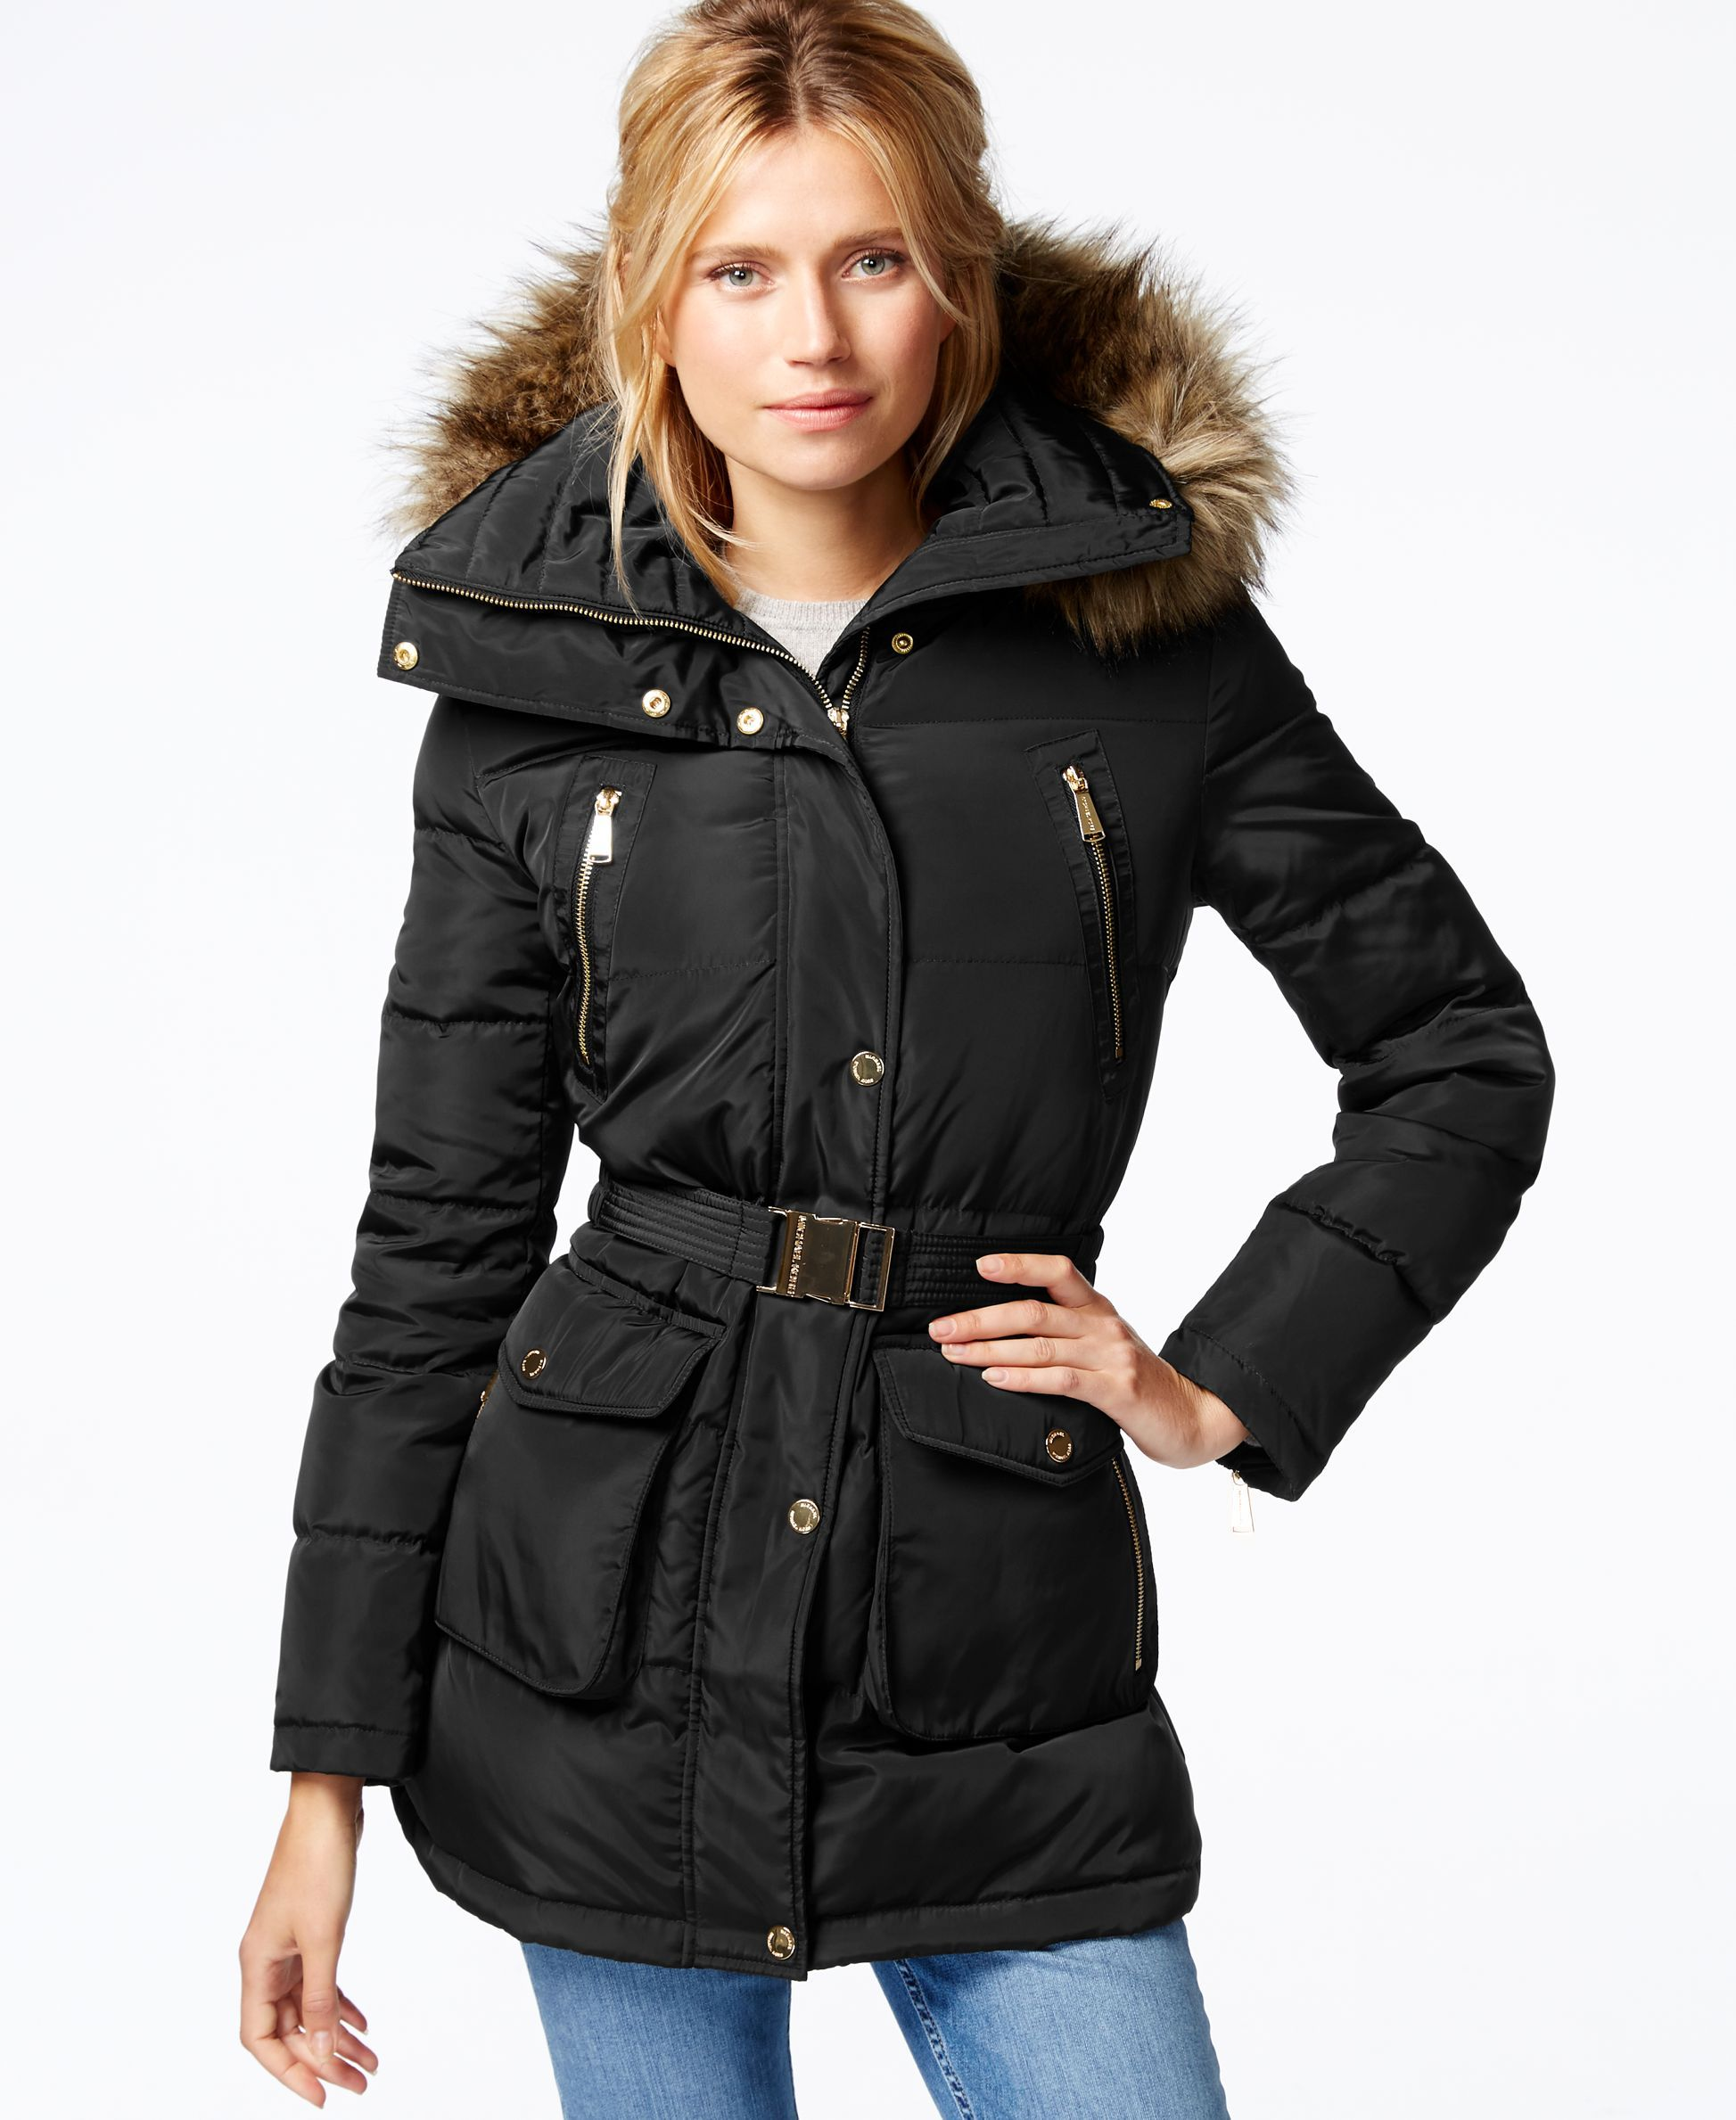 02e00bb065 MICHAEL Michael Kors Faux-Fur-Trim Belted Coat - Coats - Women - Macy's